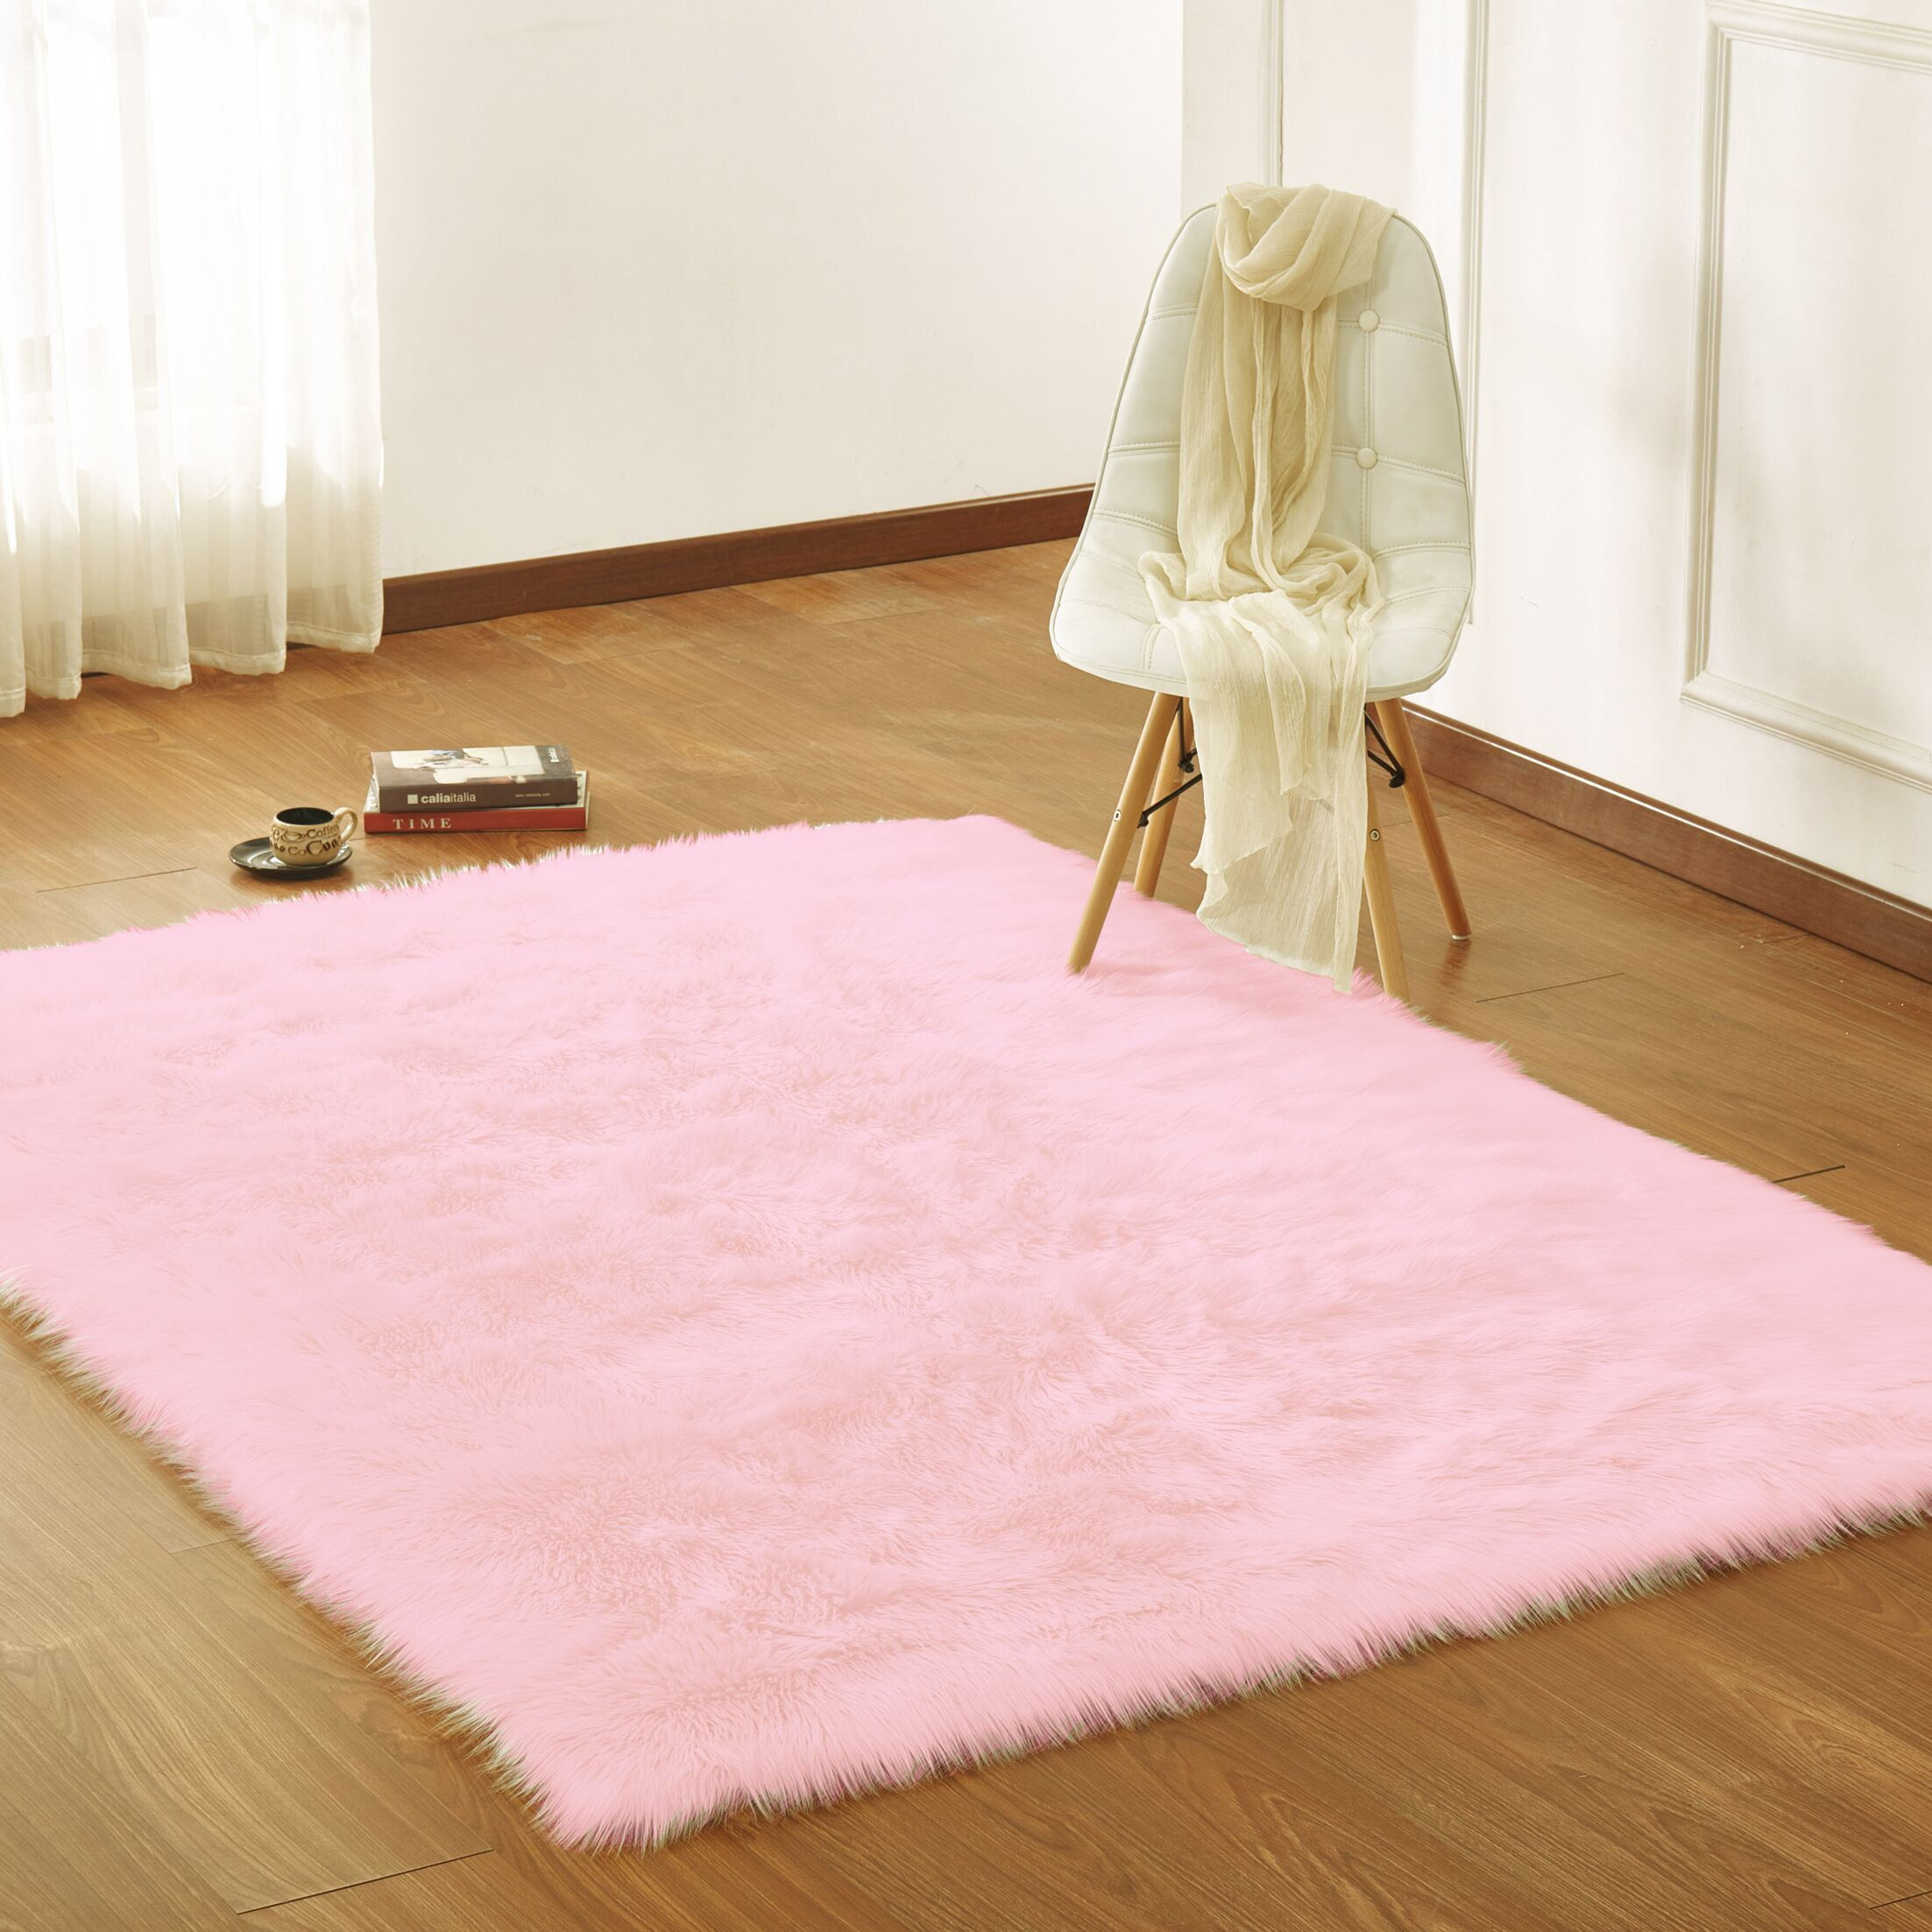 Mereworth Fox Animal Power Loom Faux Fur Pink Area Rug